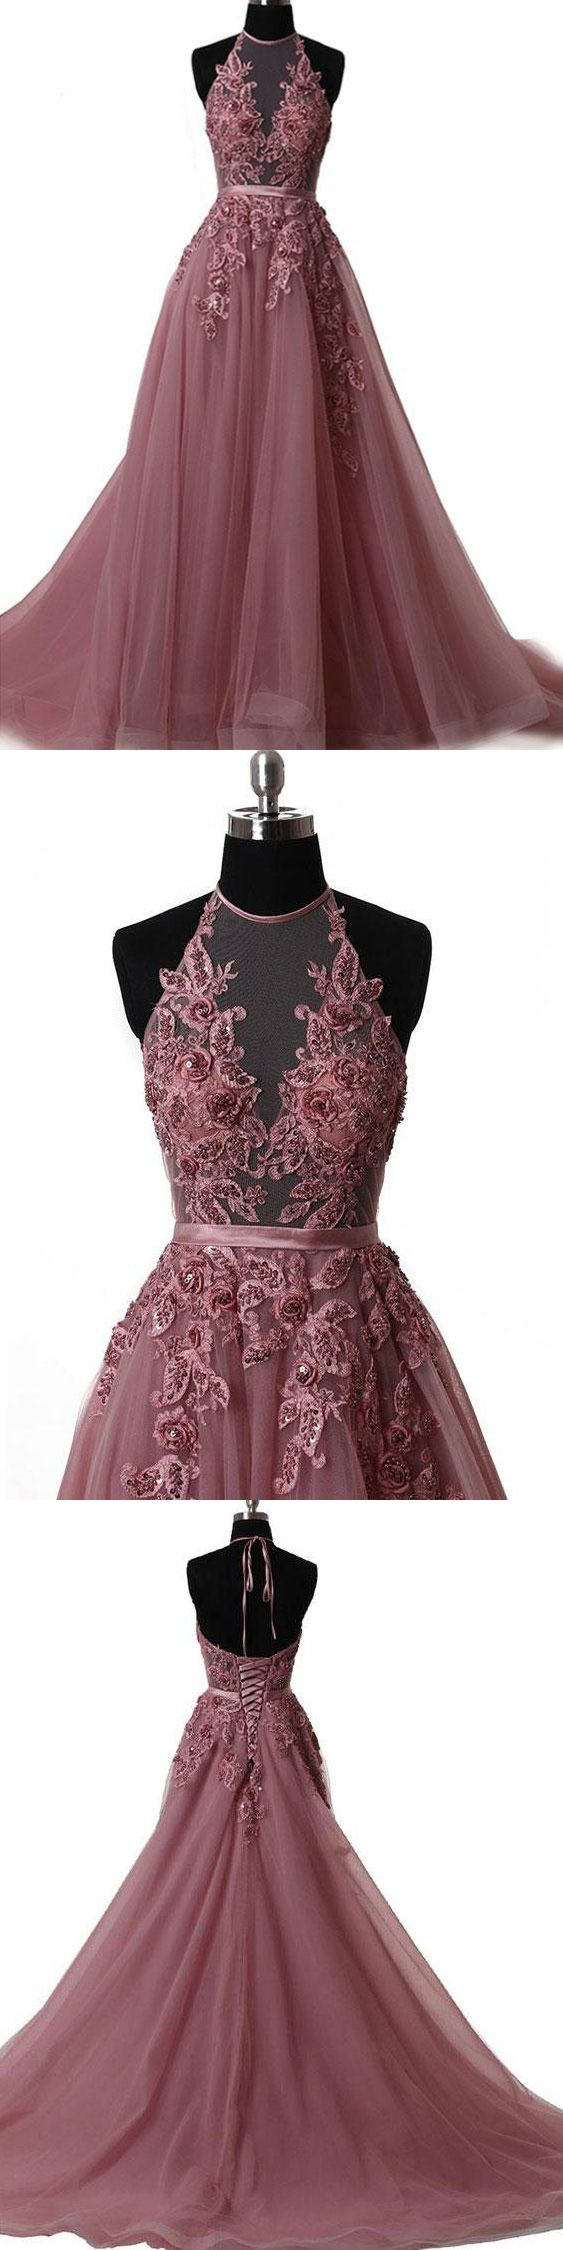 #2018 Long Prom Dress #Brush Train prom dress #Lace Prom Dress #beading prom dress #long prom dress